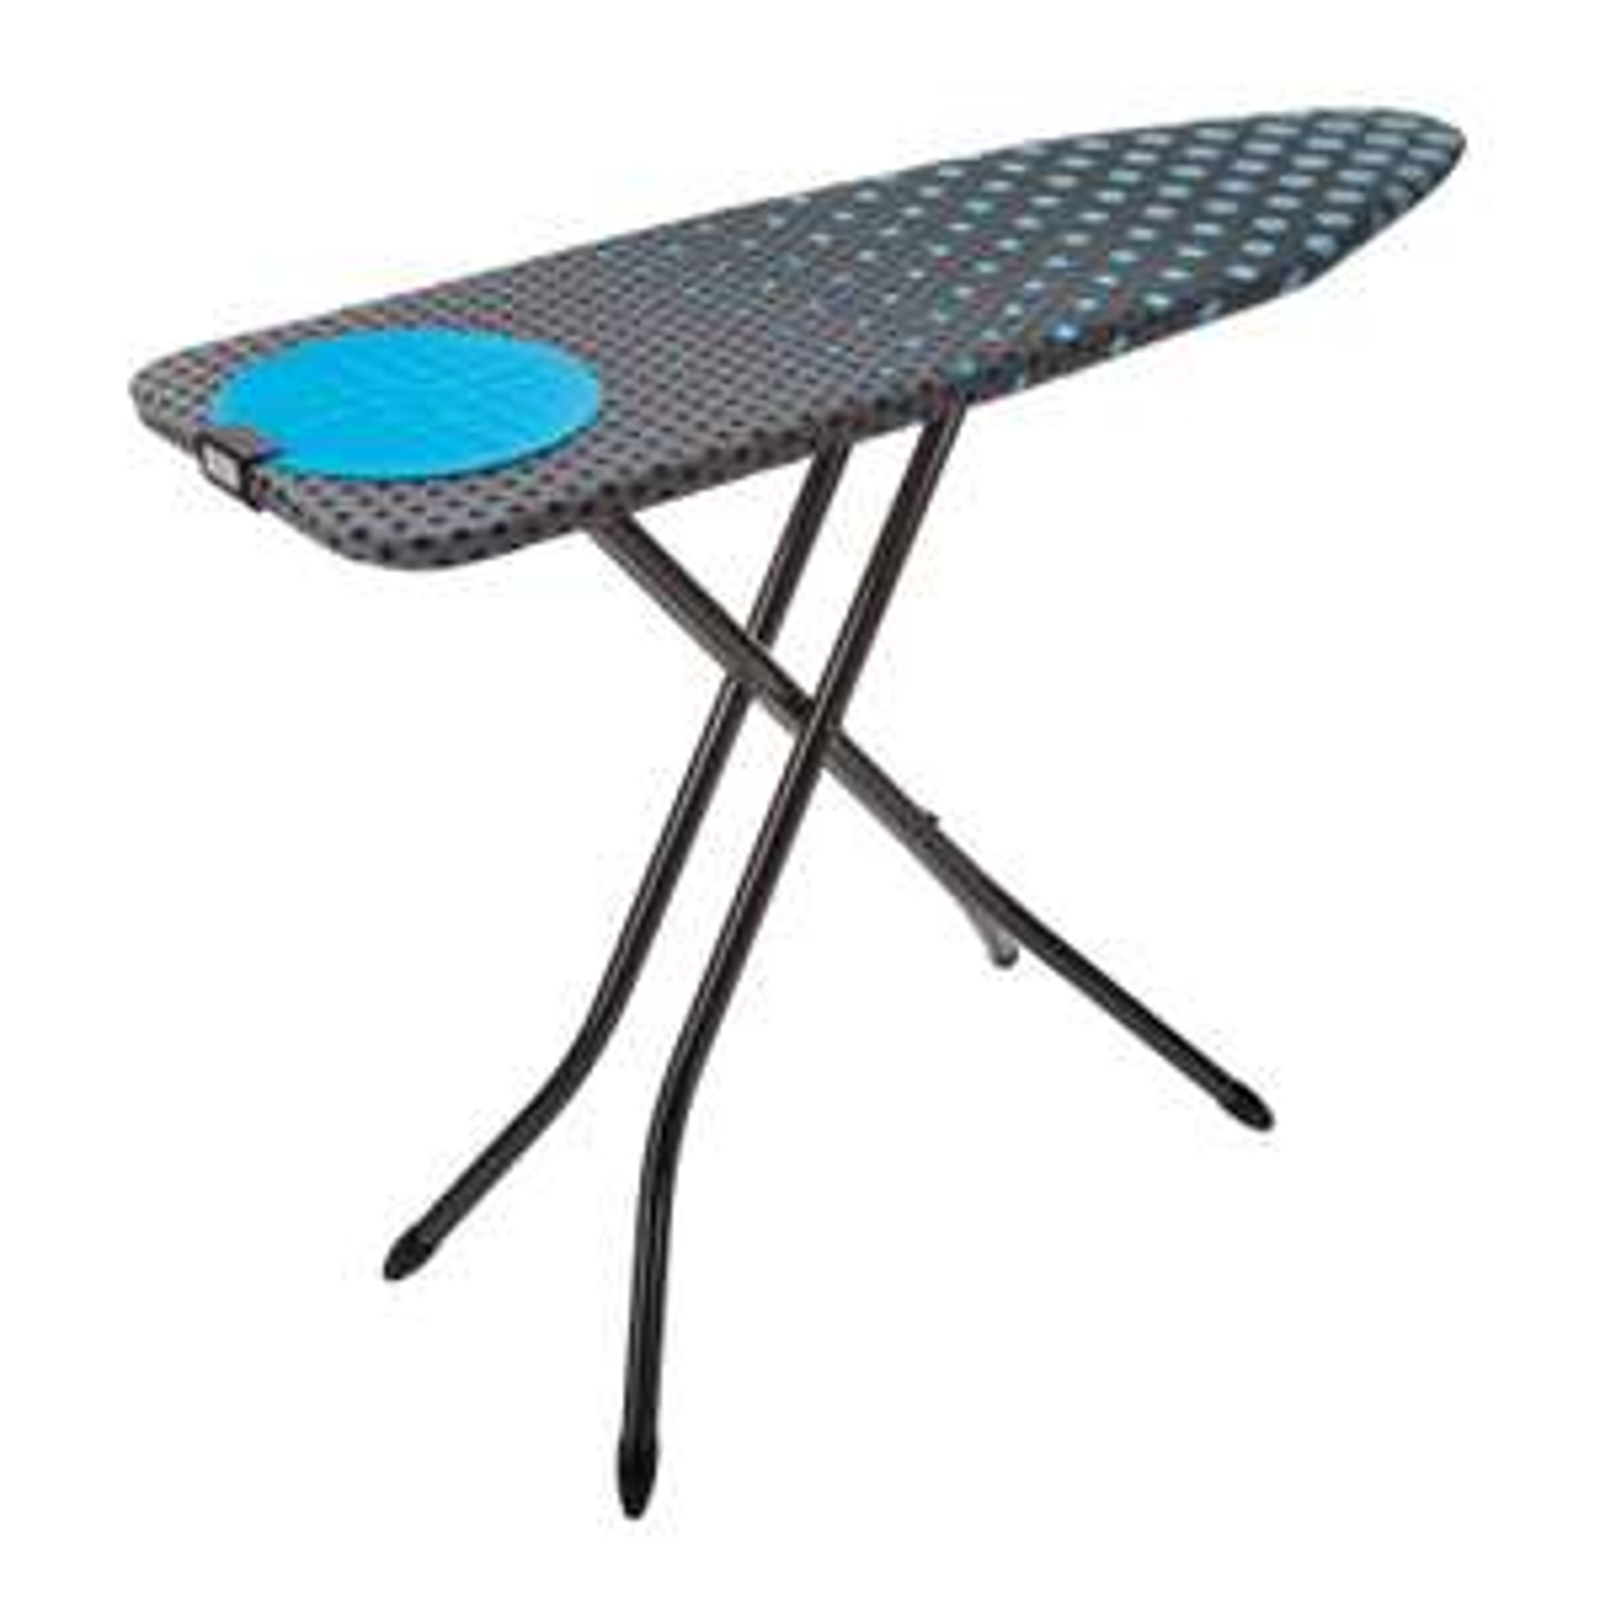 minky deals cheap price best sale in uk hotukdeals. Black Bedroom Furniture Sets. Home Design Ideas